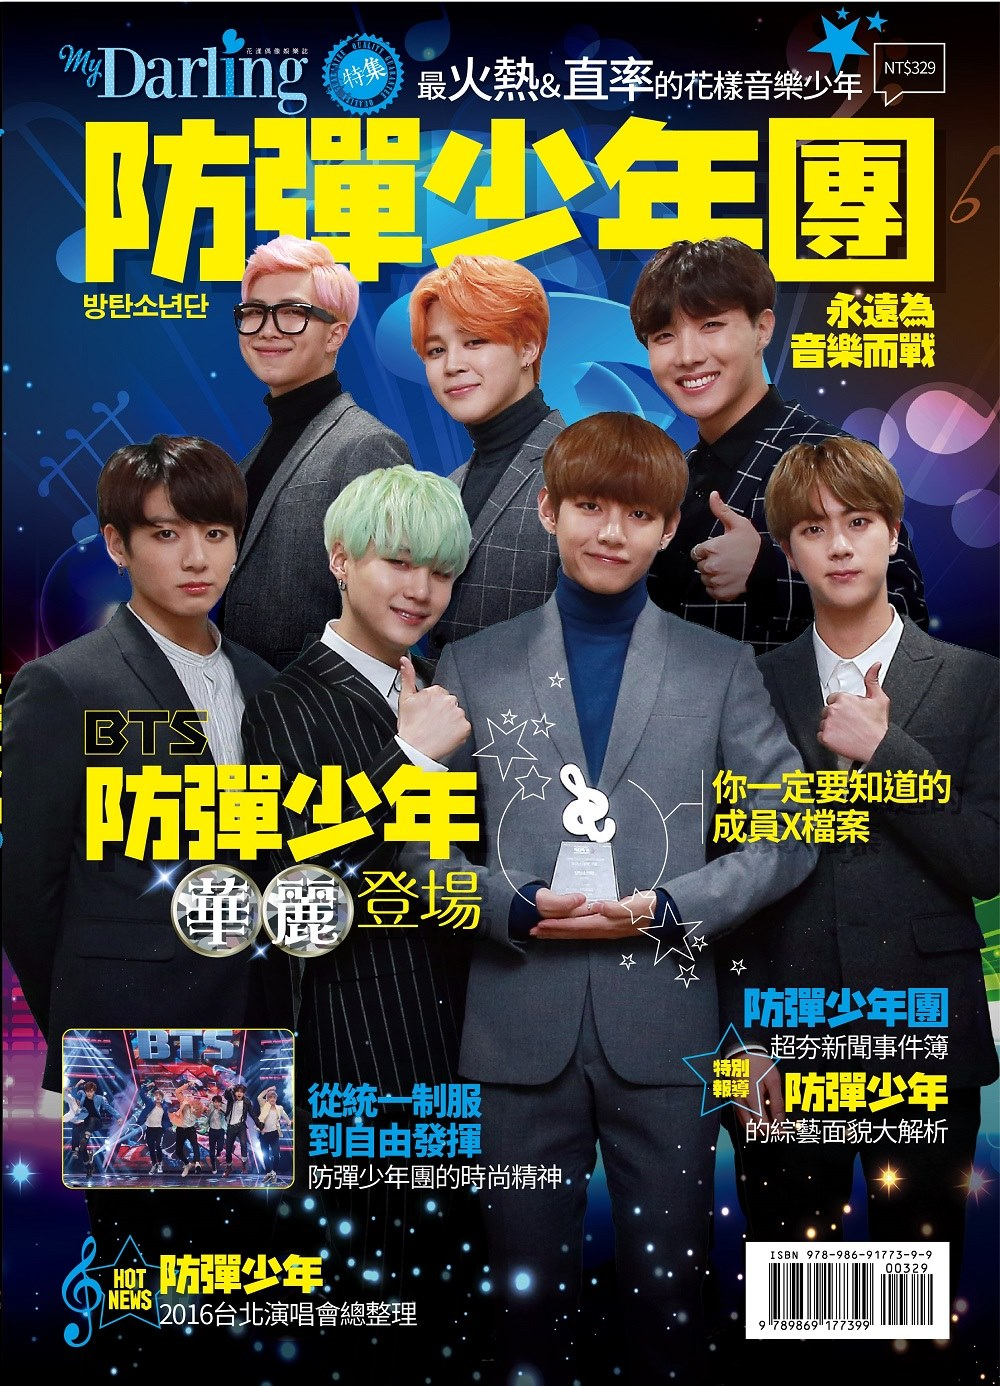 BTS防彈少年團:永遠為音樂而戰,最火熱&直率的花樣音樂少年!